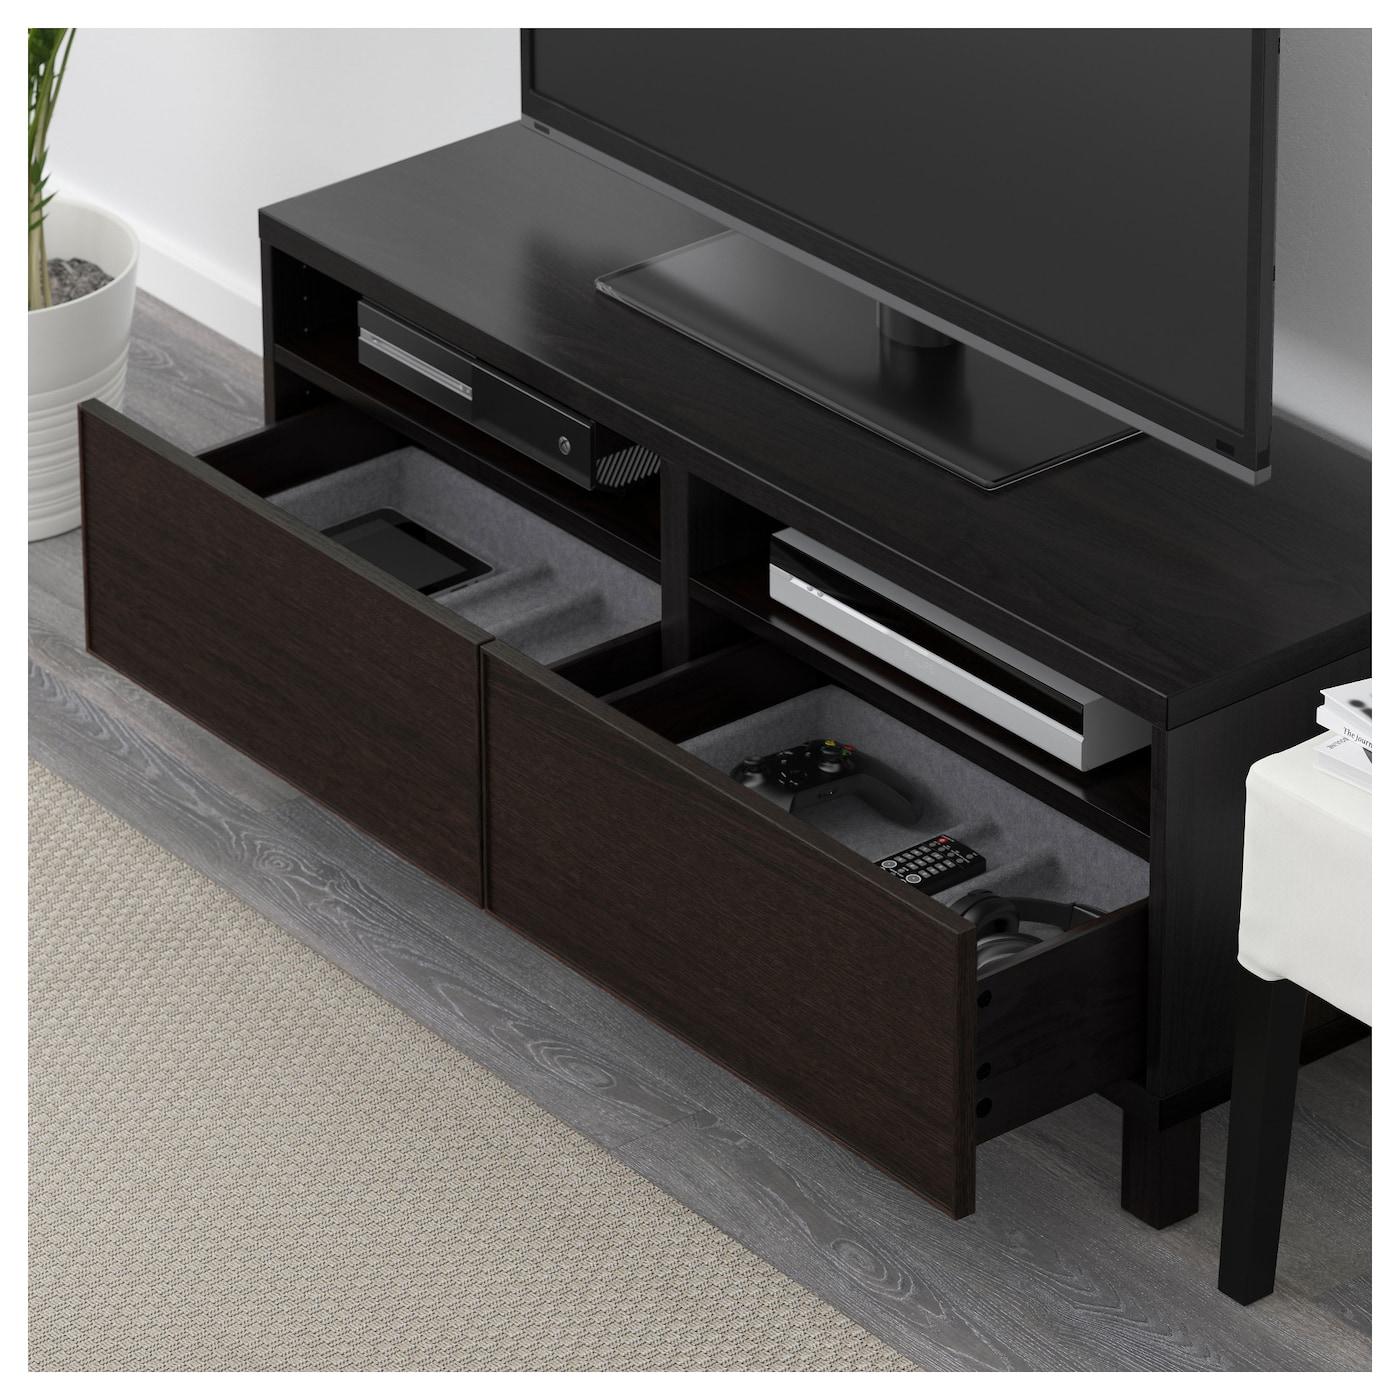 Best Tv Bench With Drawers Black Brown Inviken Black Brown 120x40x48 Cm Ikea